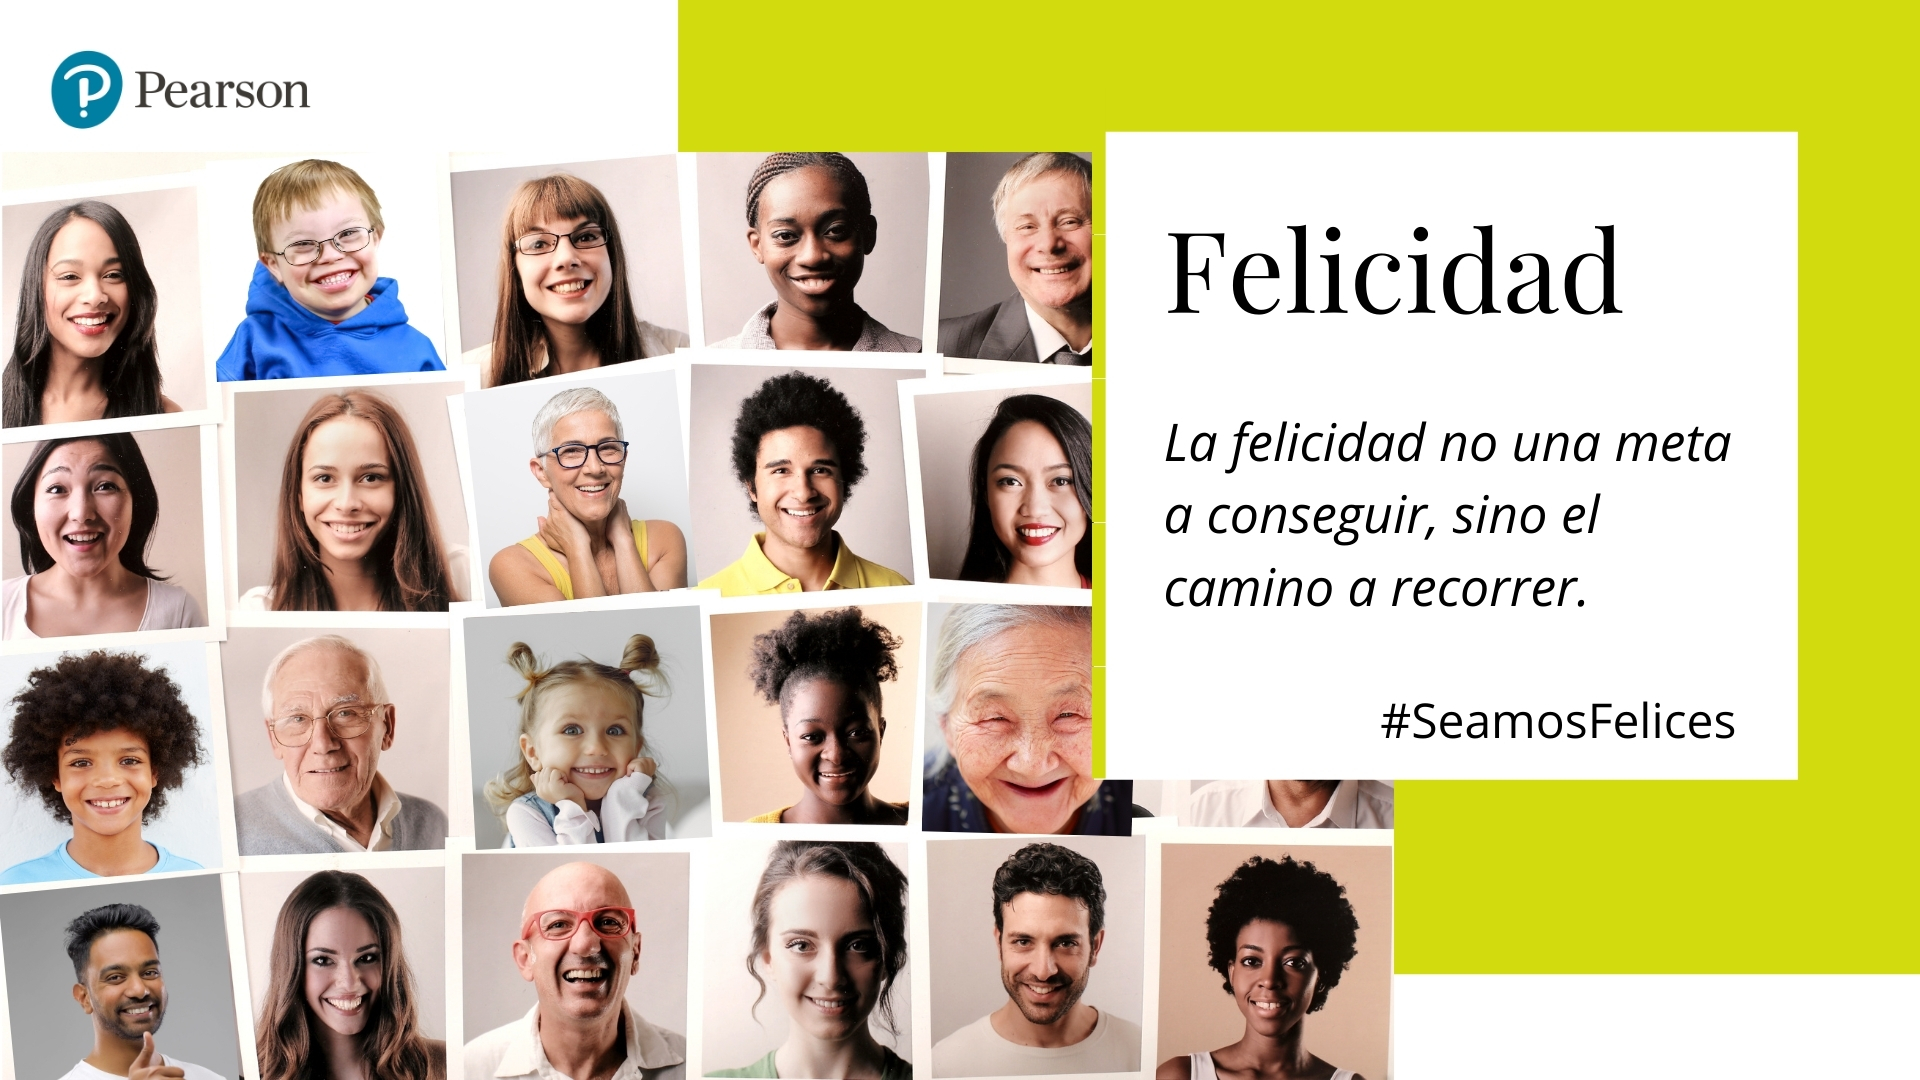 Felicidad_Pearson_Clinical